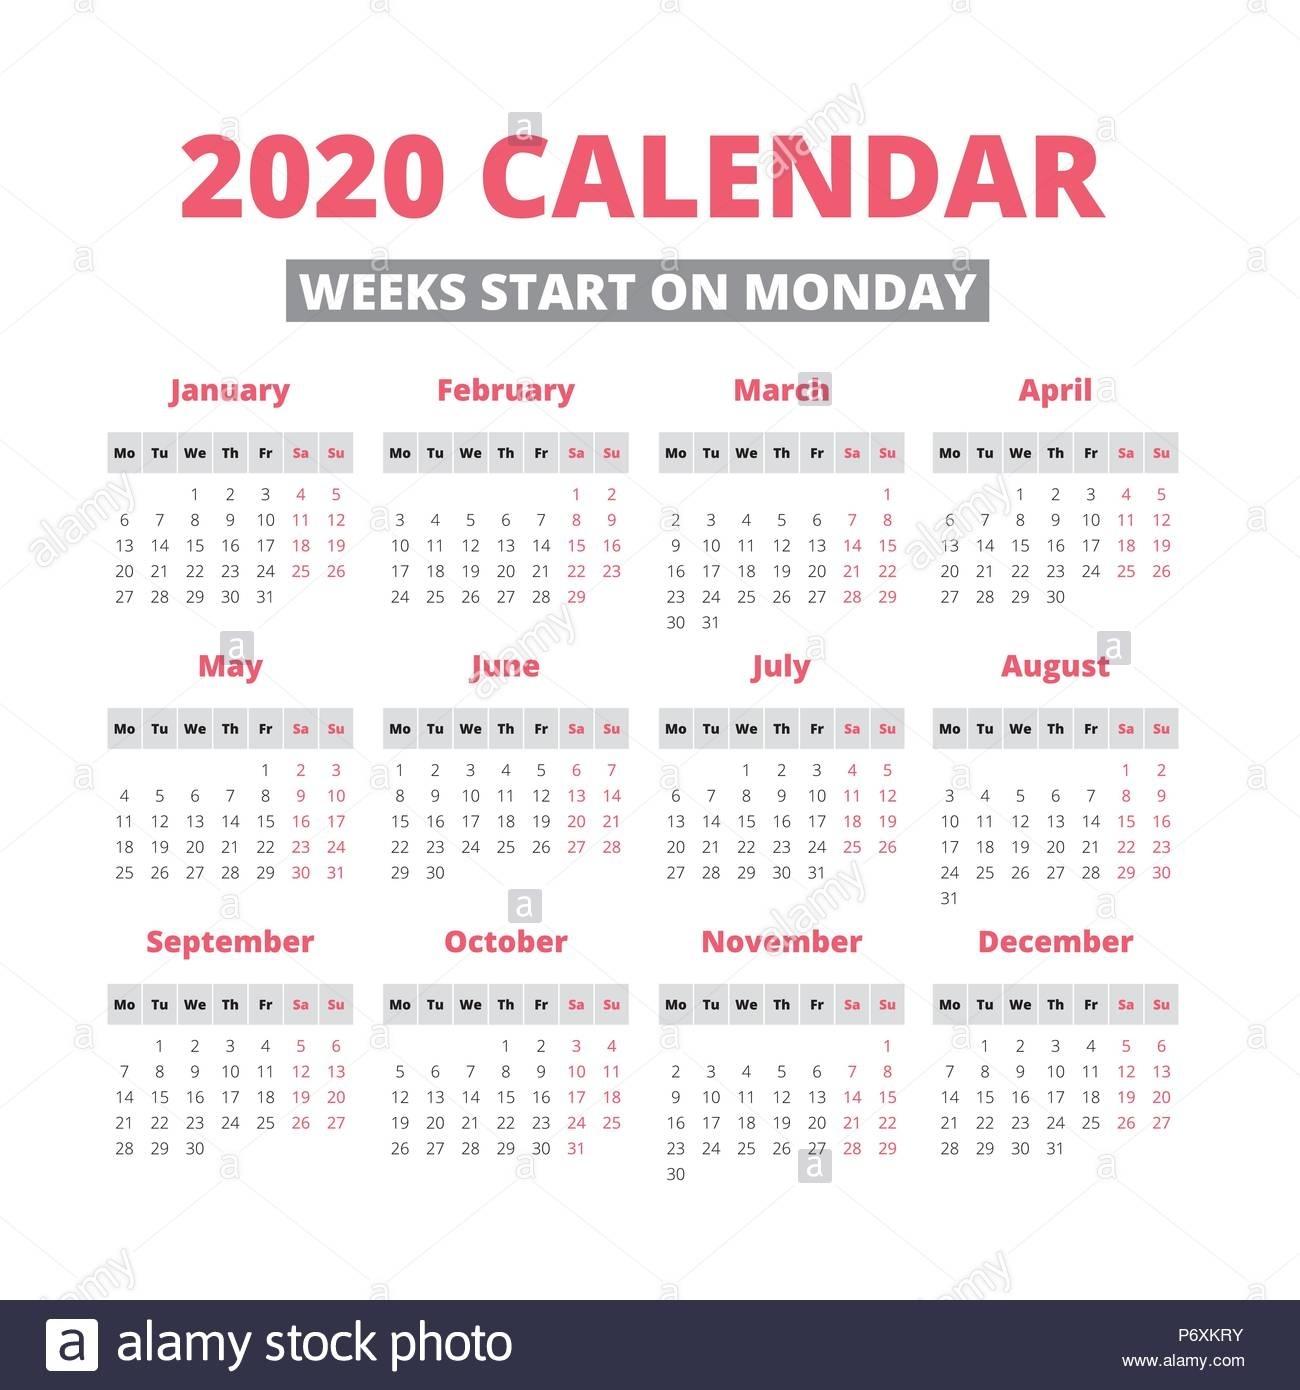 Perky 2020 Calendar Starting On Monday • Printable Blank Calendar throughout 2020 Calendar Starting On Monday